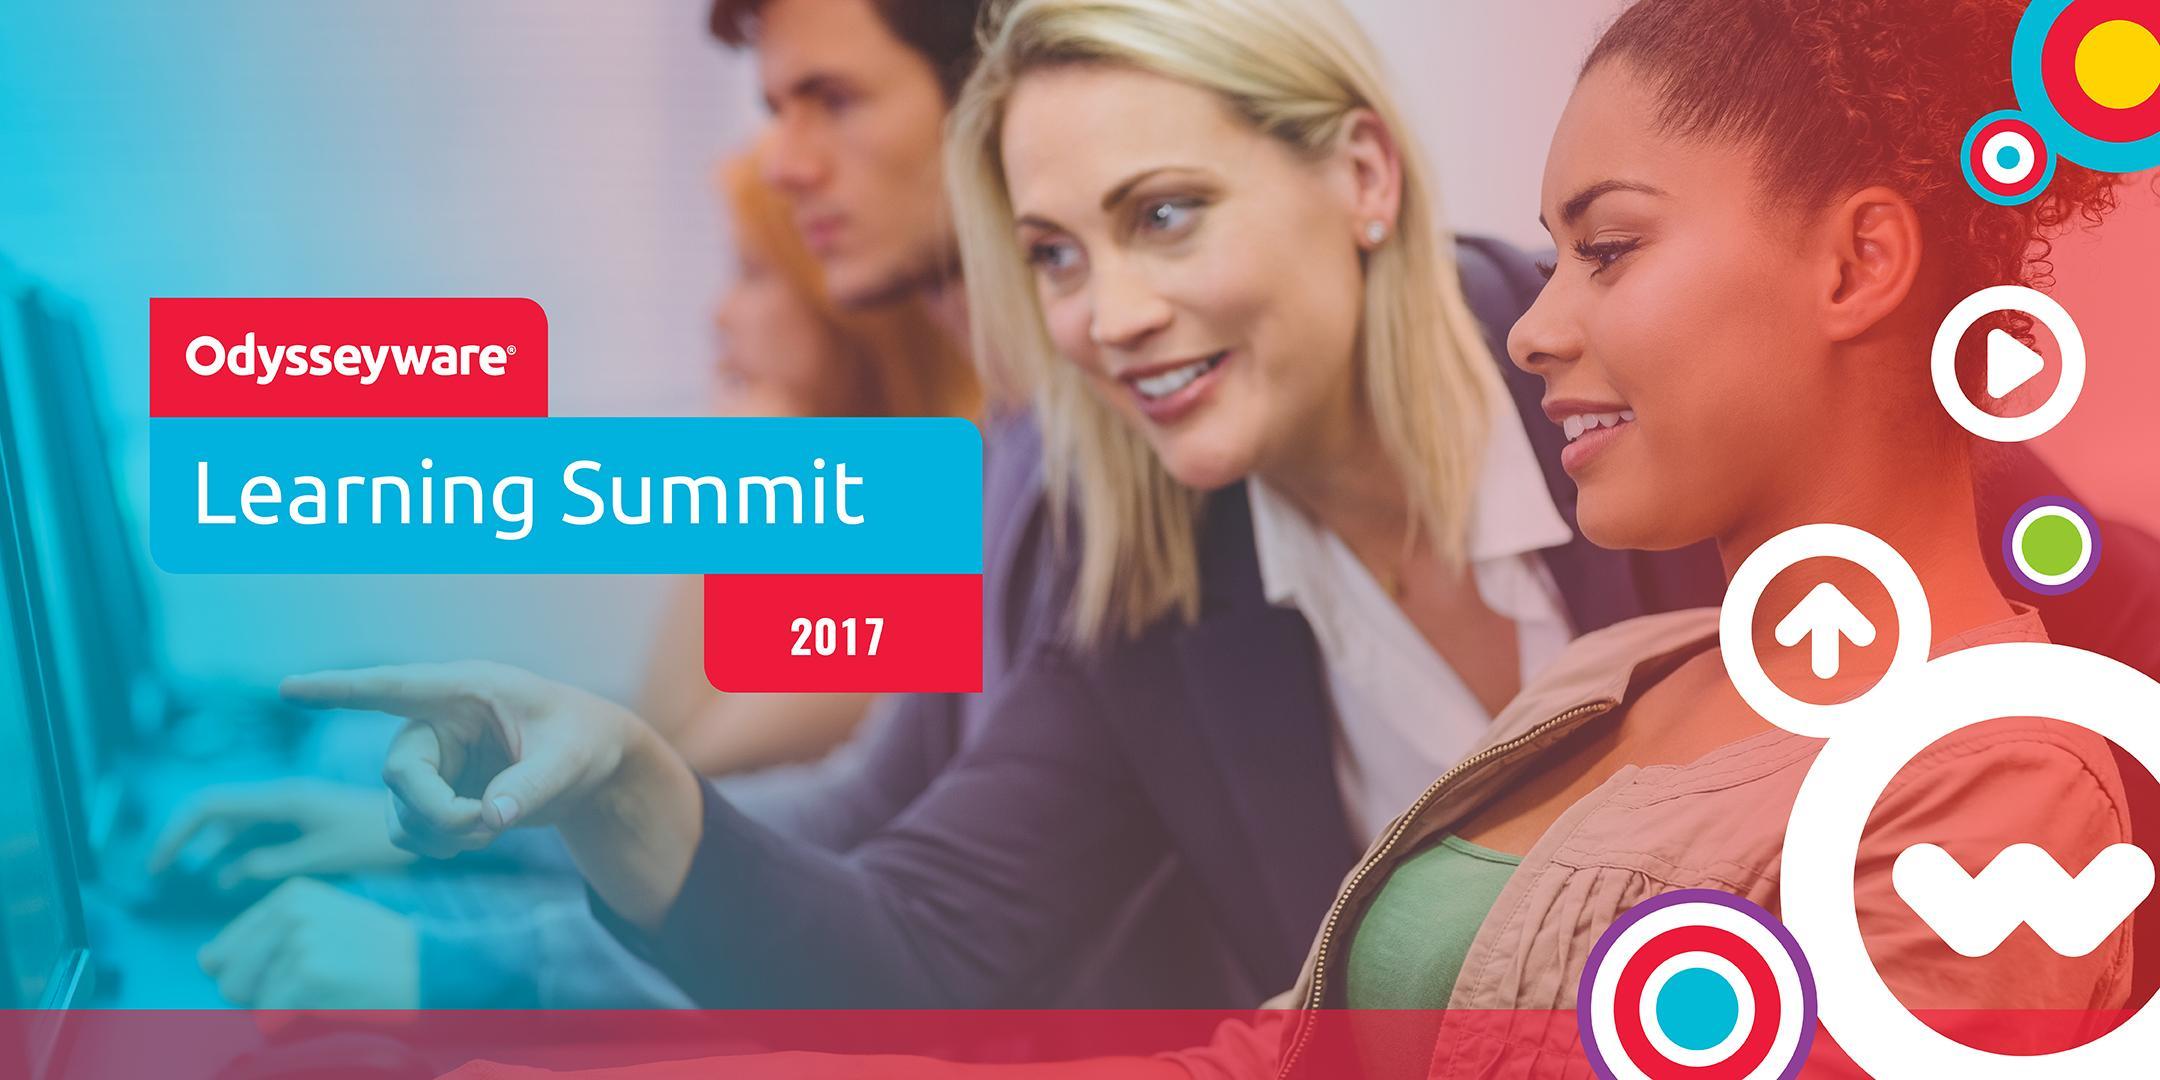 Odysseyware Learning Summit - San Antonio, TX